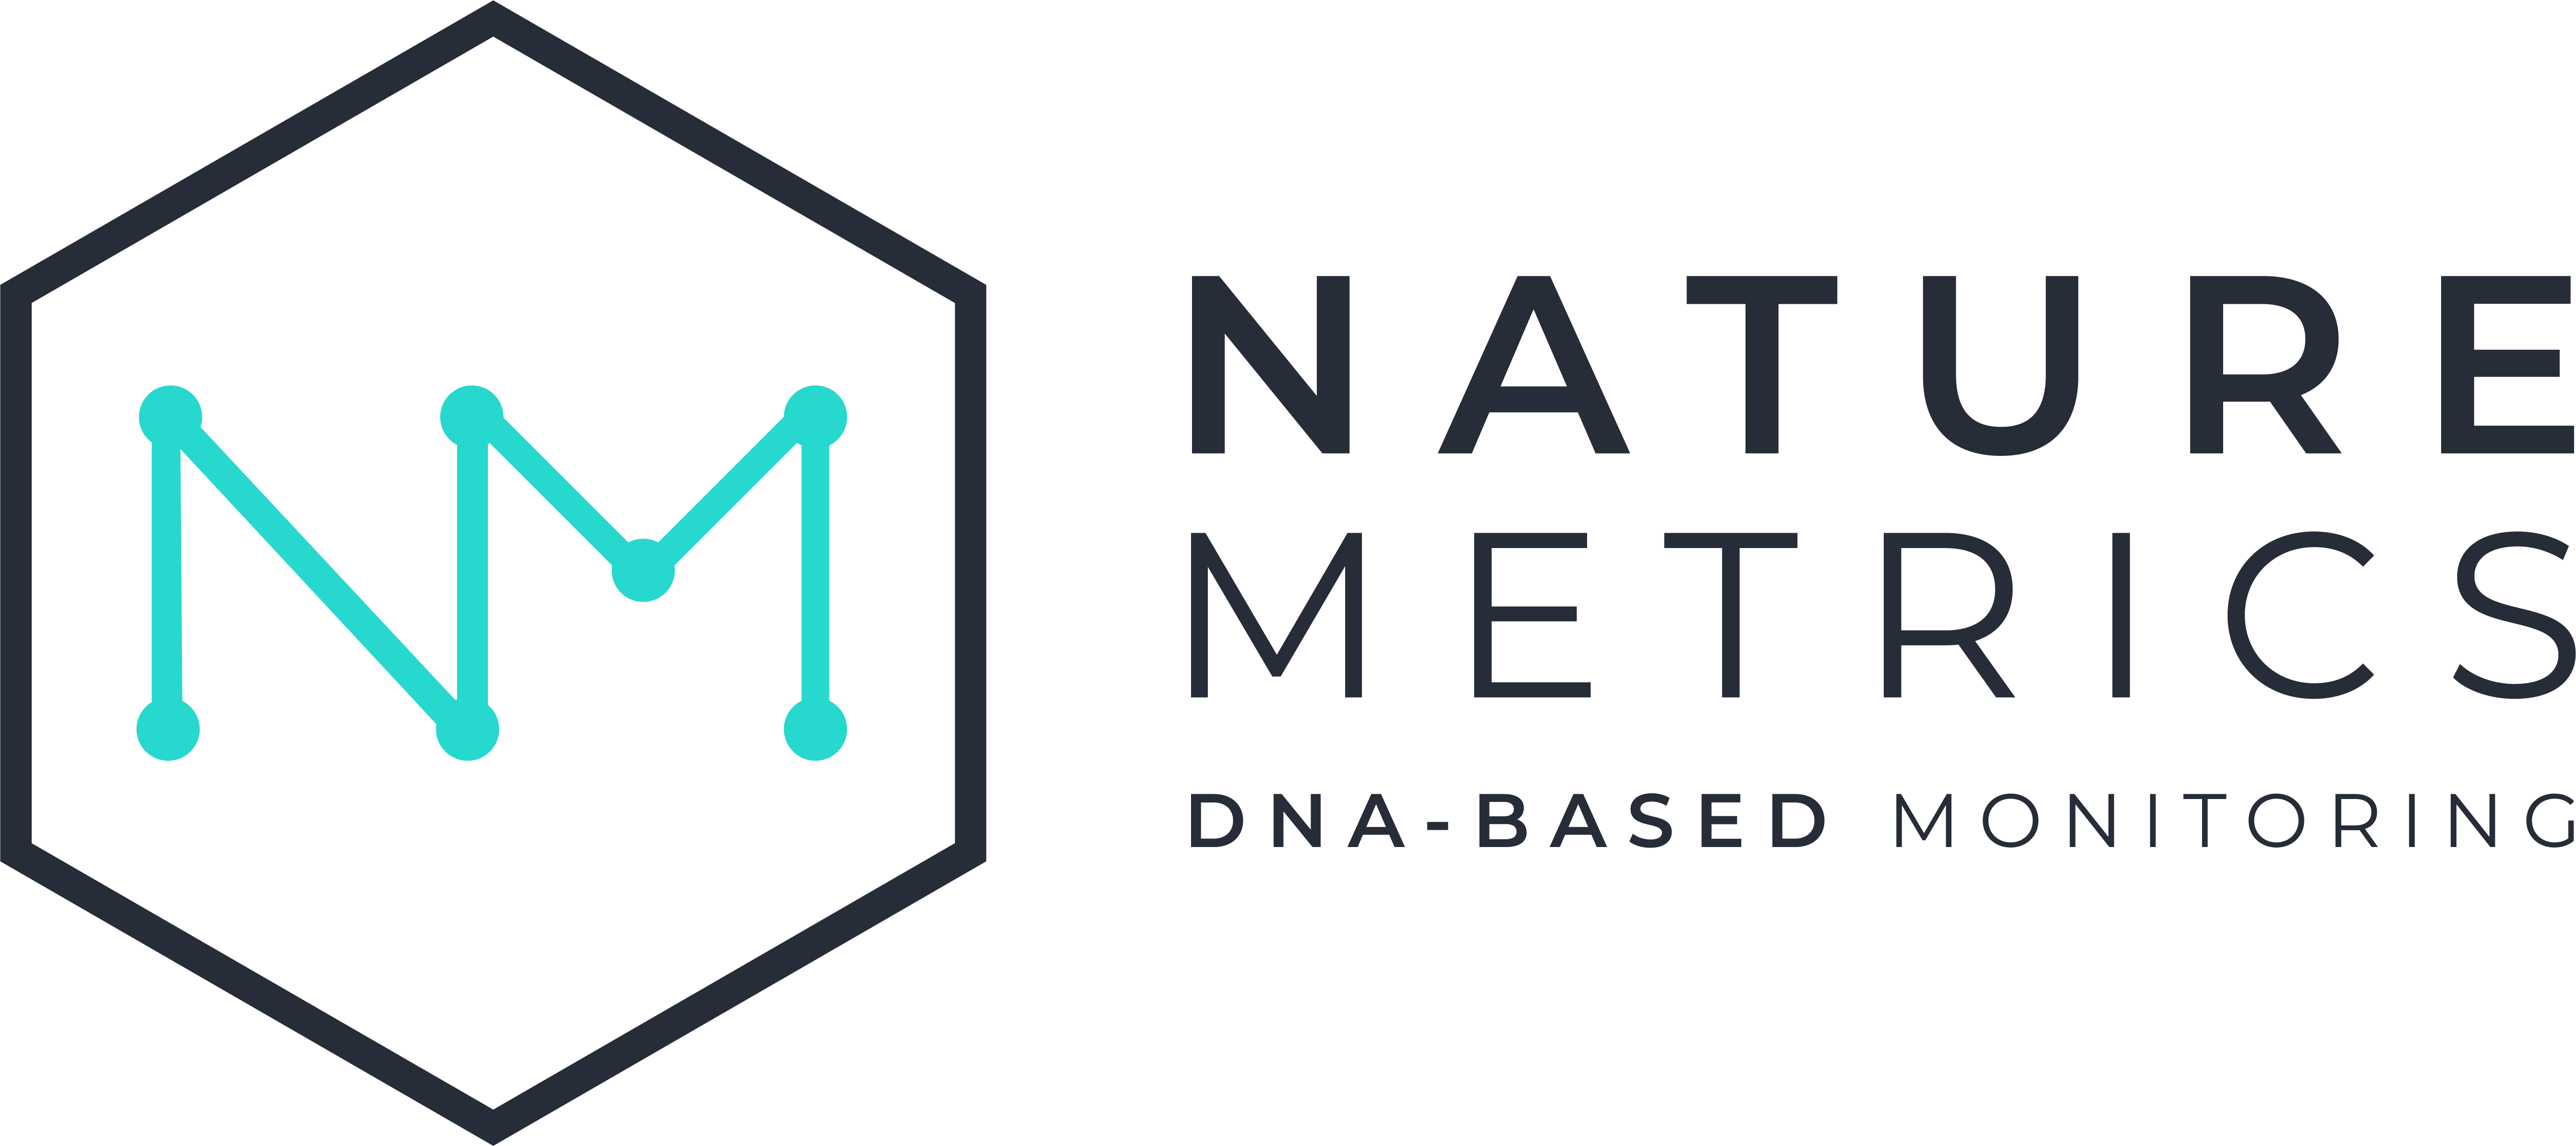 Nature Metrics's logo